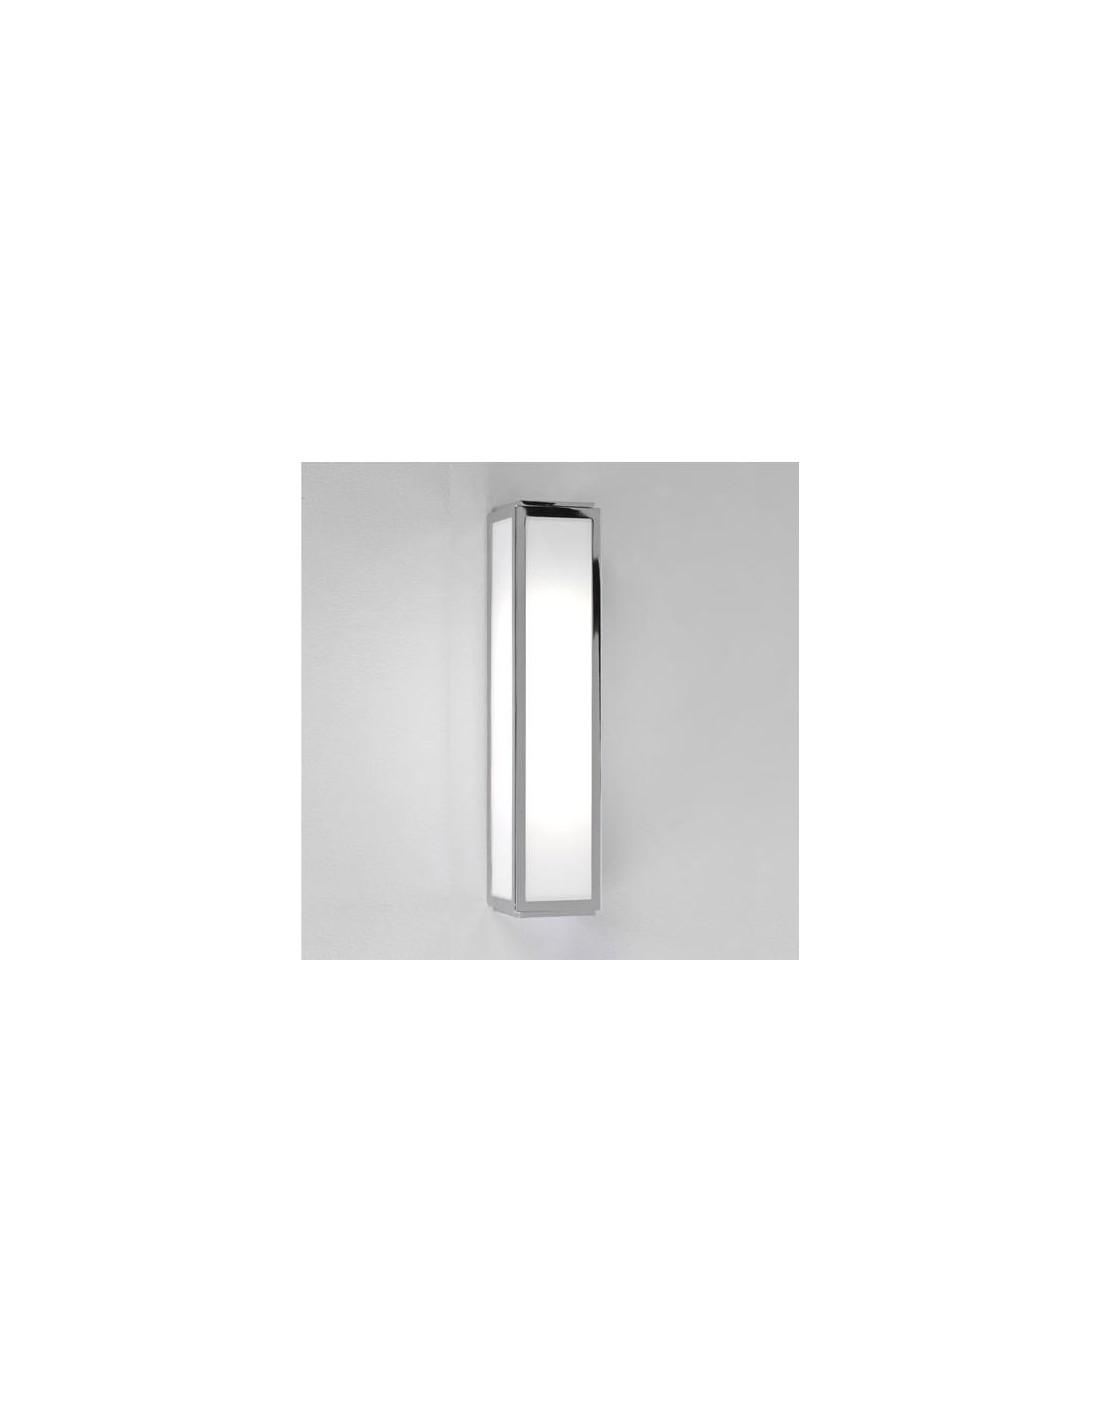 Applique Mashiko 360 LED chrome Astro Lighting - Valente Design